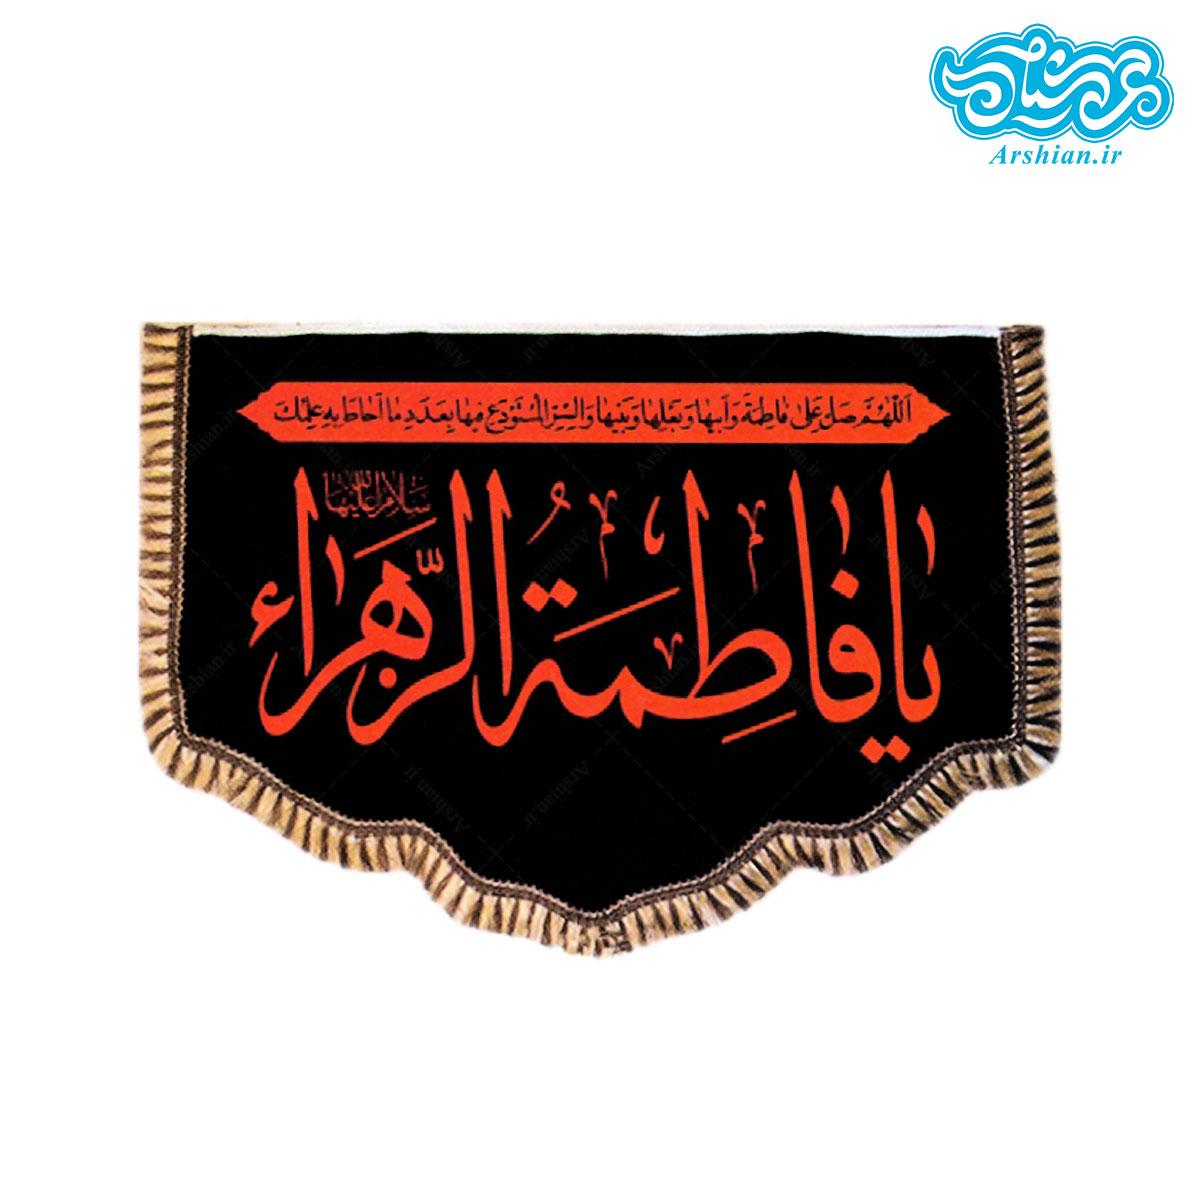 پرچم مخمل یافاطمه الزهرا کد014